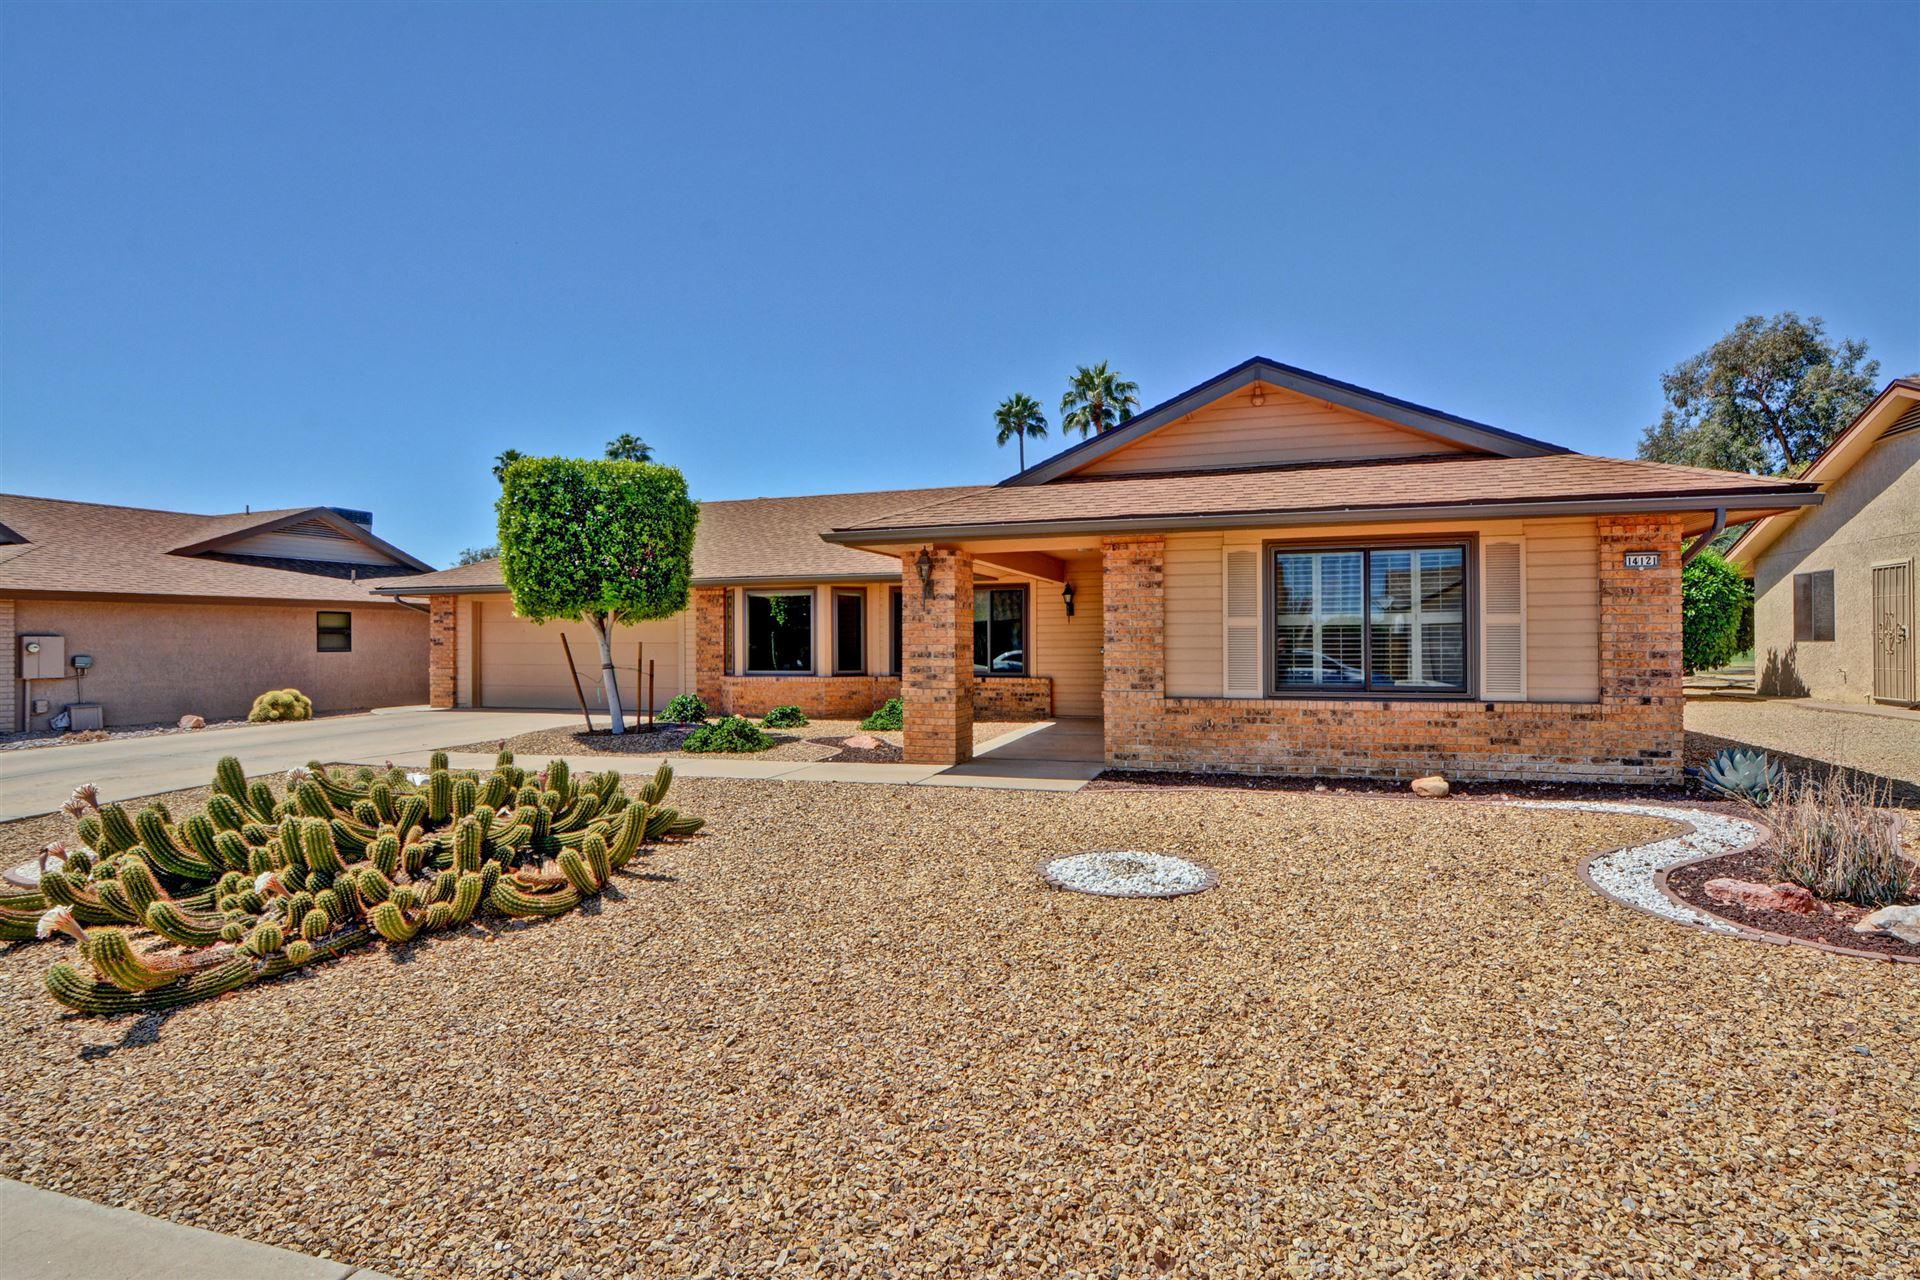 Photo of 14121 W PENNYSTONE Drive, Sun City West, AZ 85375 (MLS # 6229199)